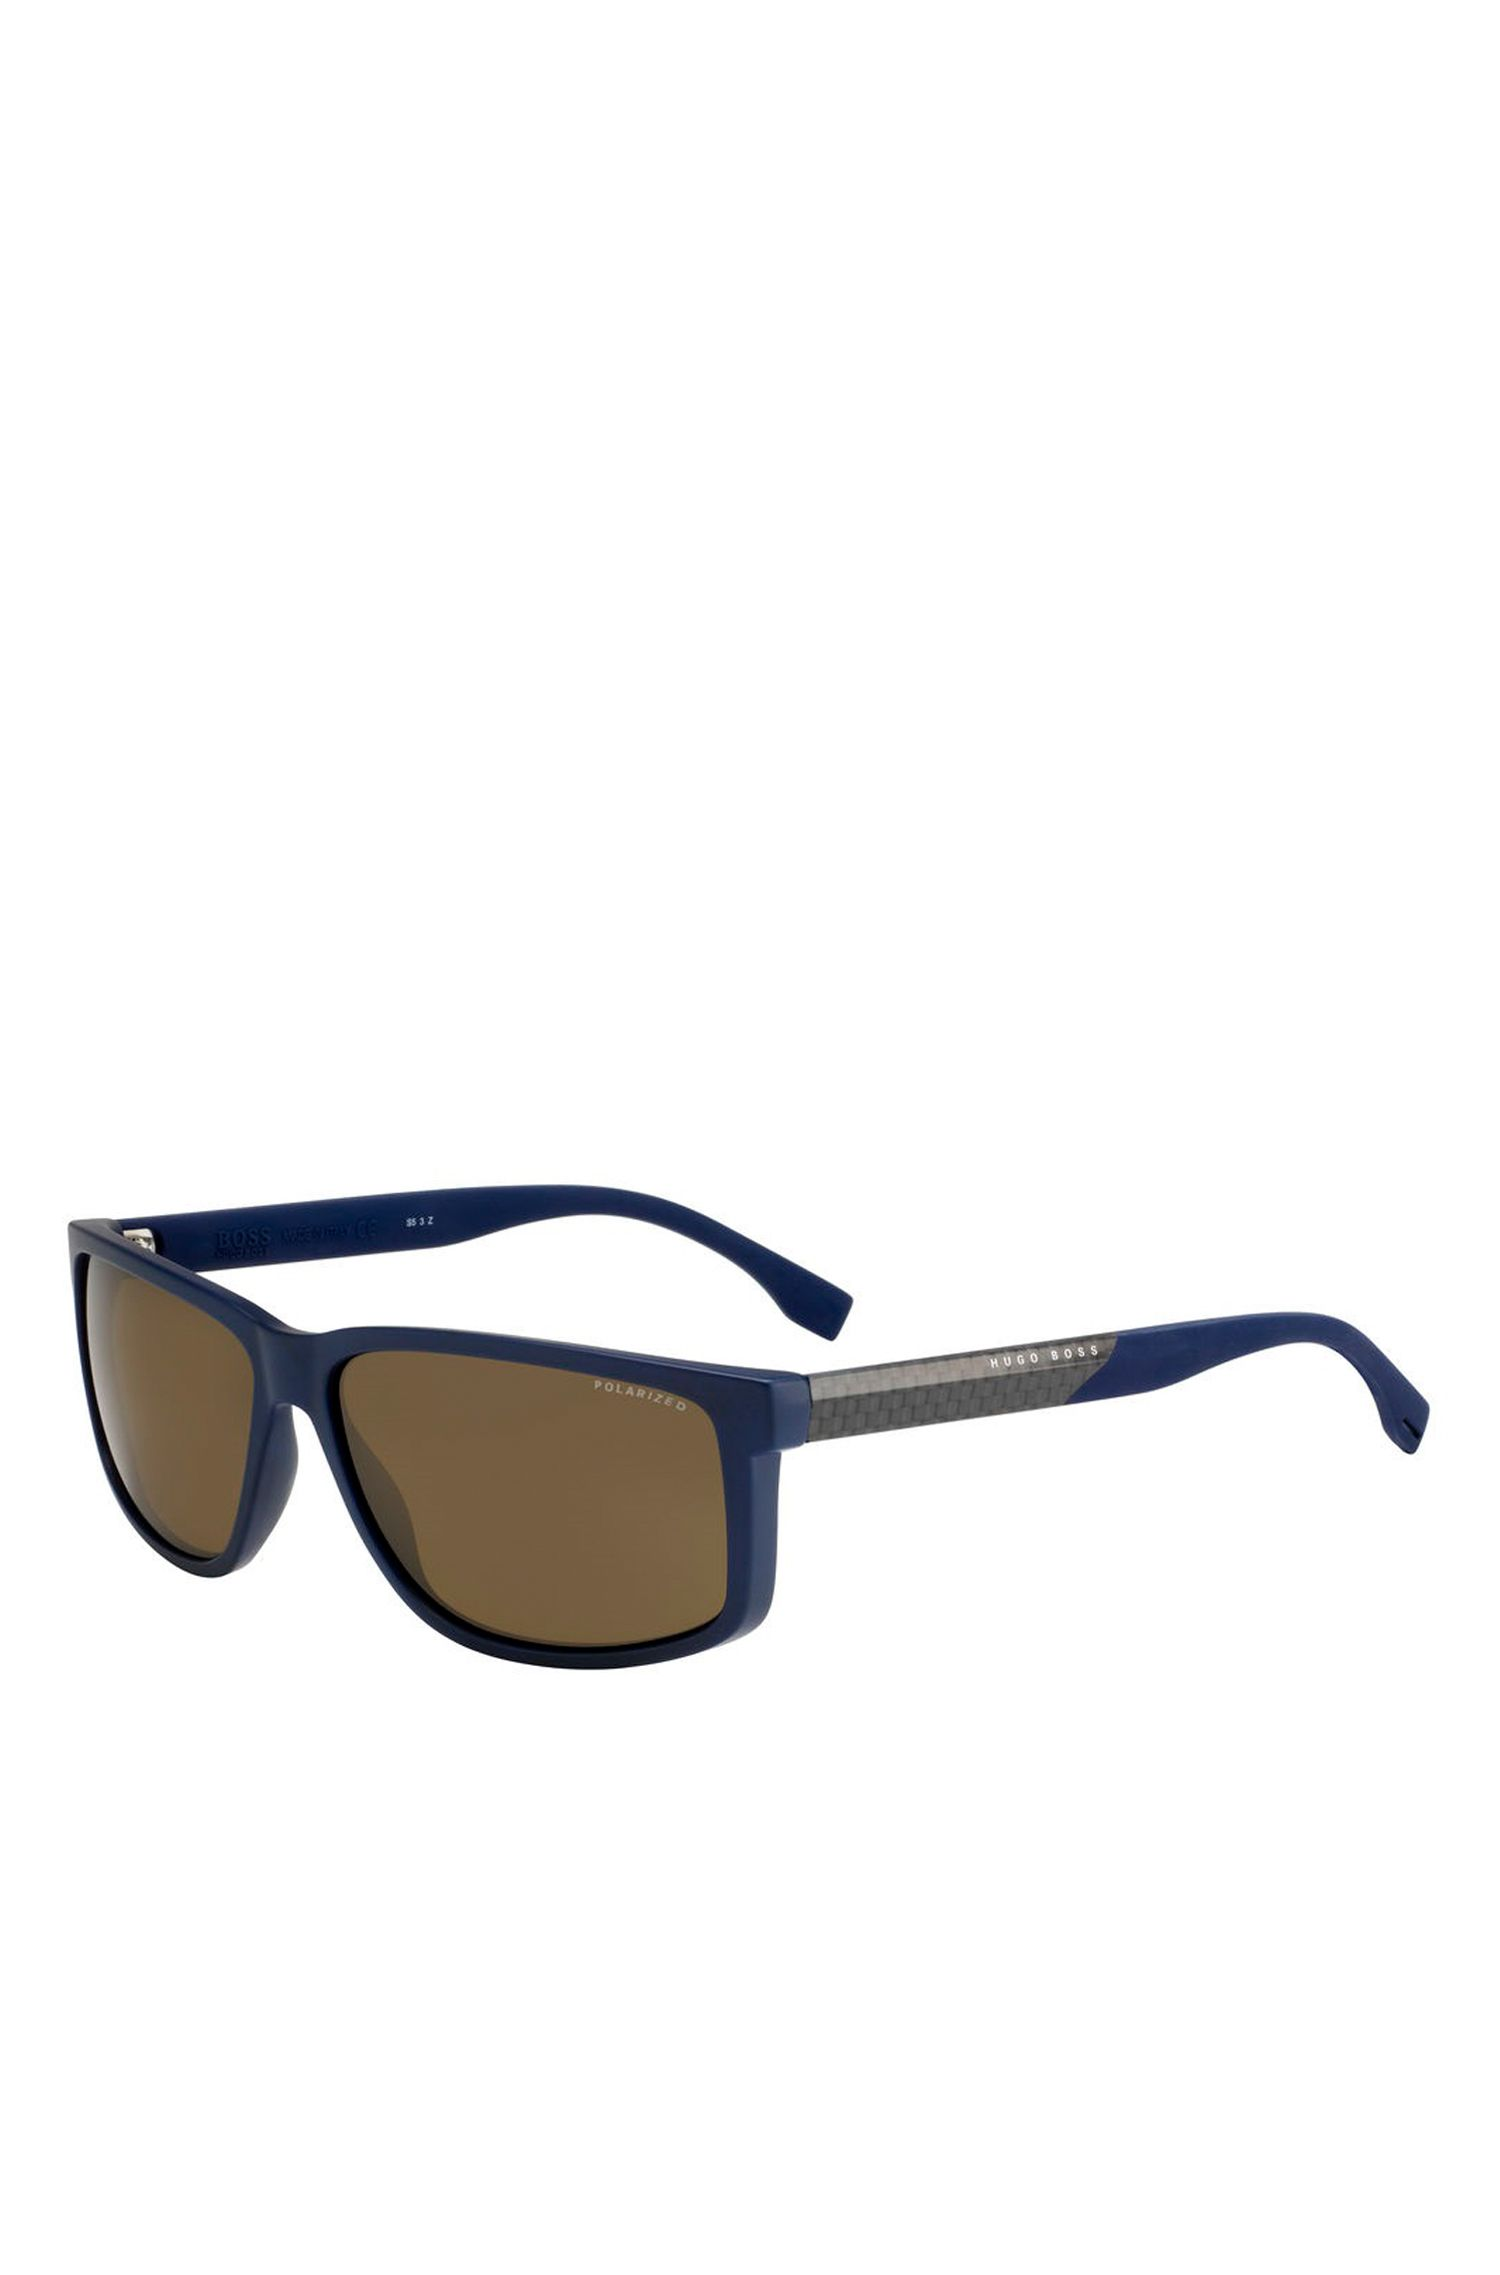 'BOSS 0833S' | Rectangular Brown Lens Carbon Fiber Sunglasses